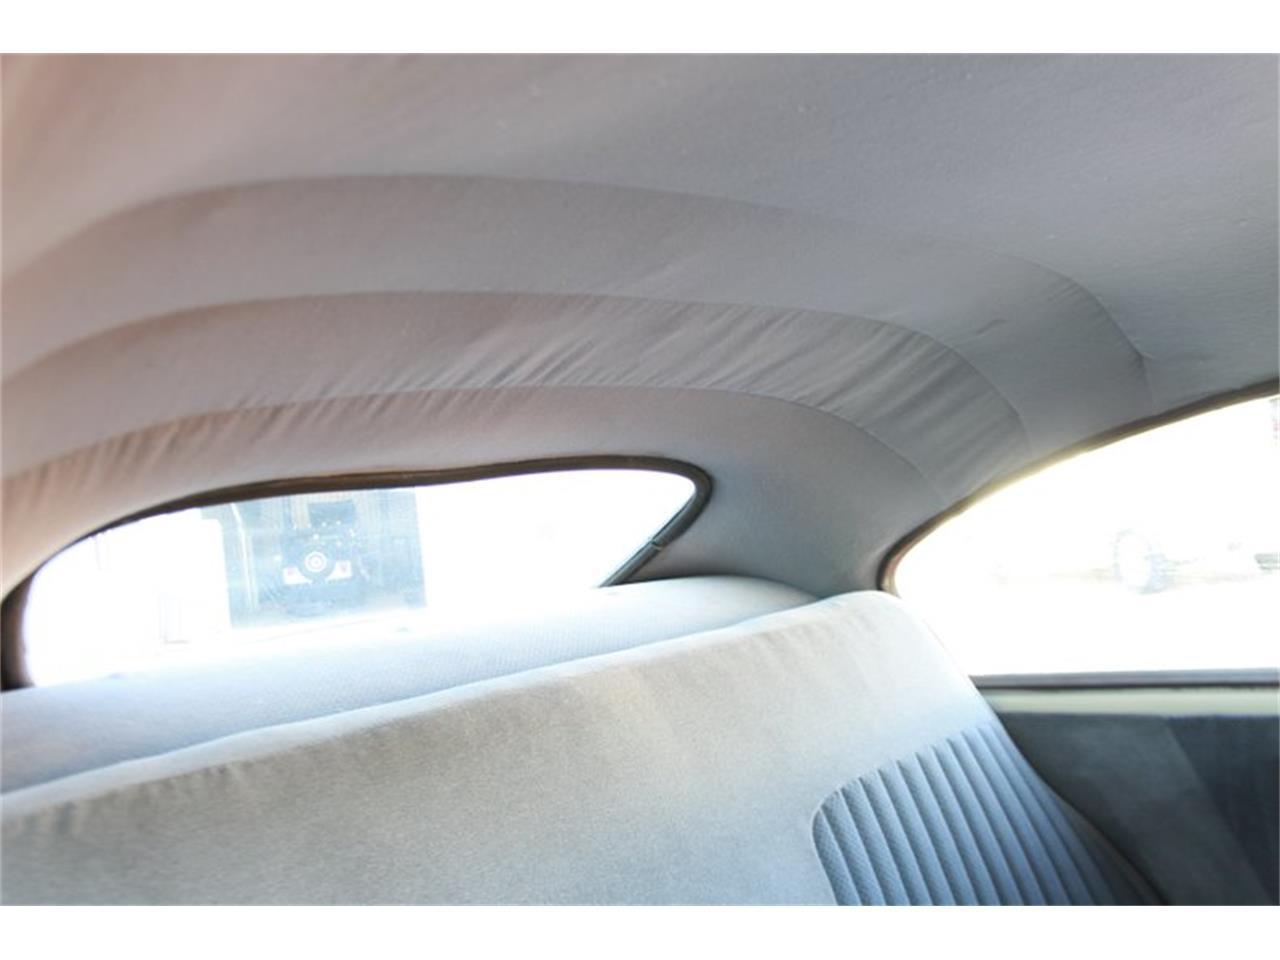 Large Picture of '53 Henry J Corsair Deluxe located in Vernal Utah - $14,000.00 - LDCW